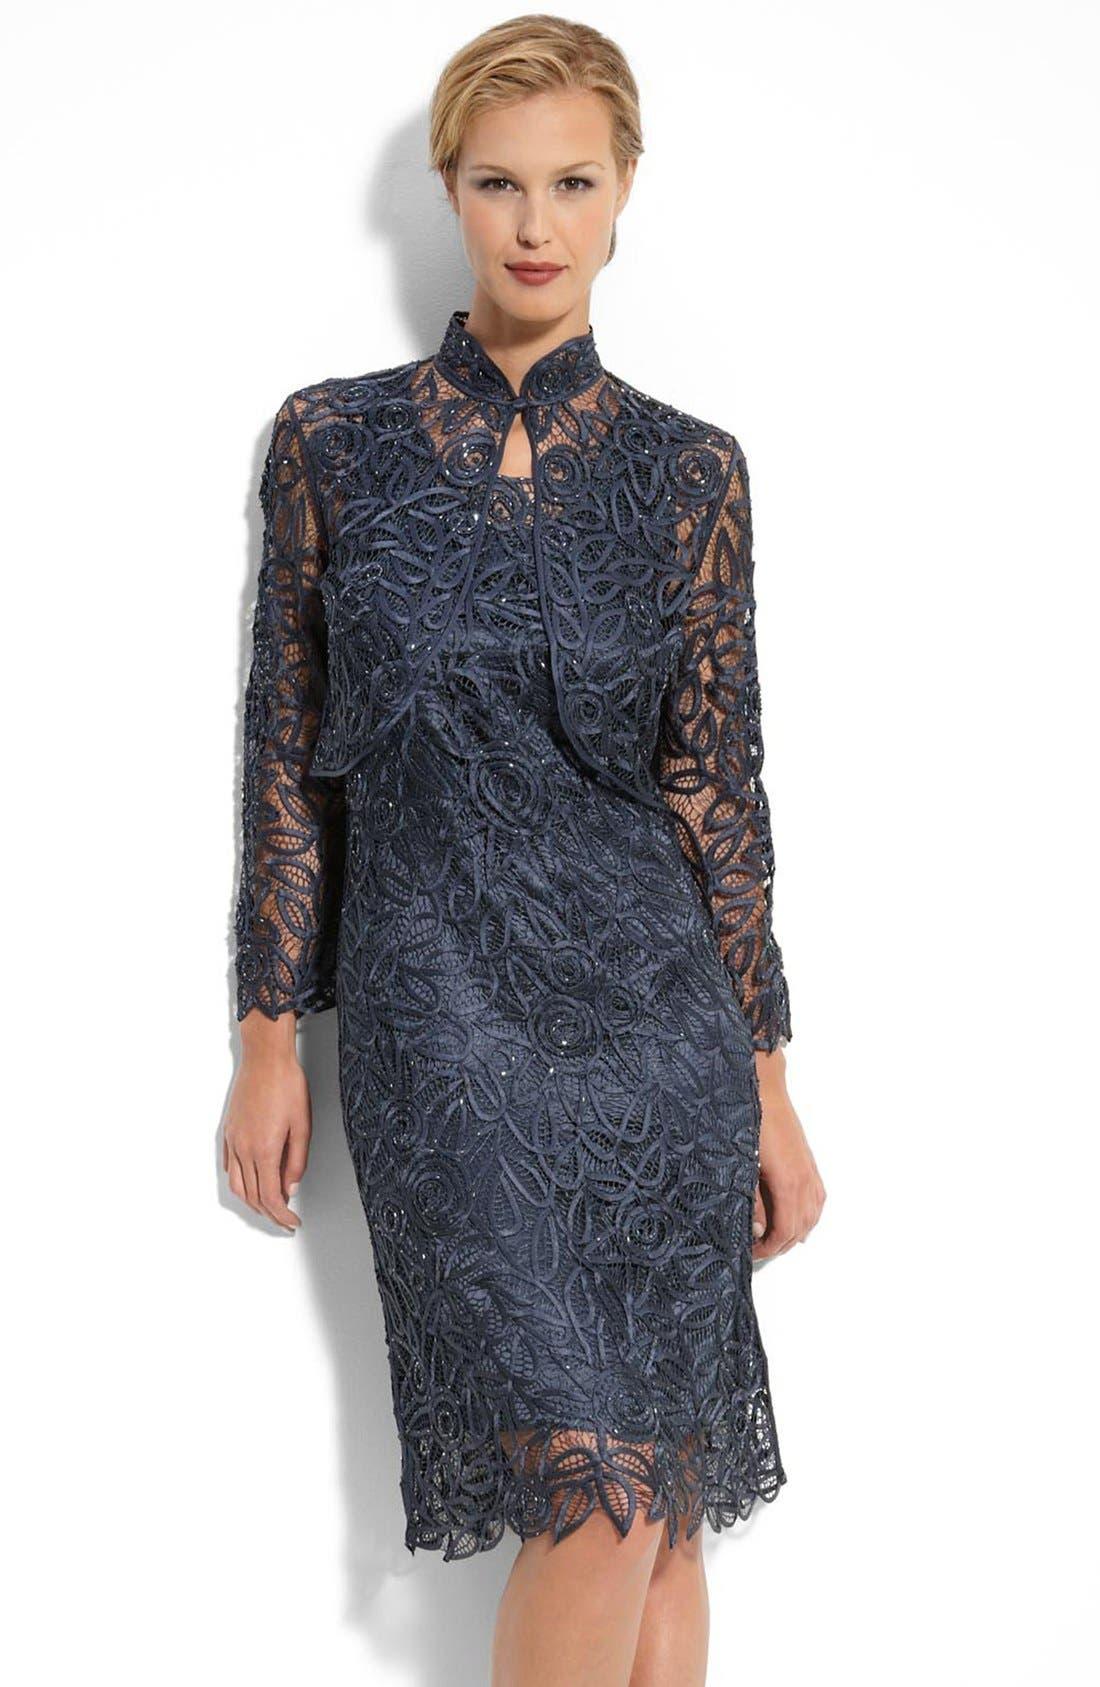 Main Image - Soulmates Crochet Silk Dress & Jacket